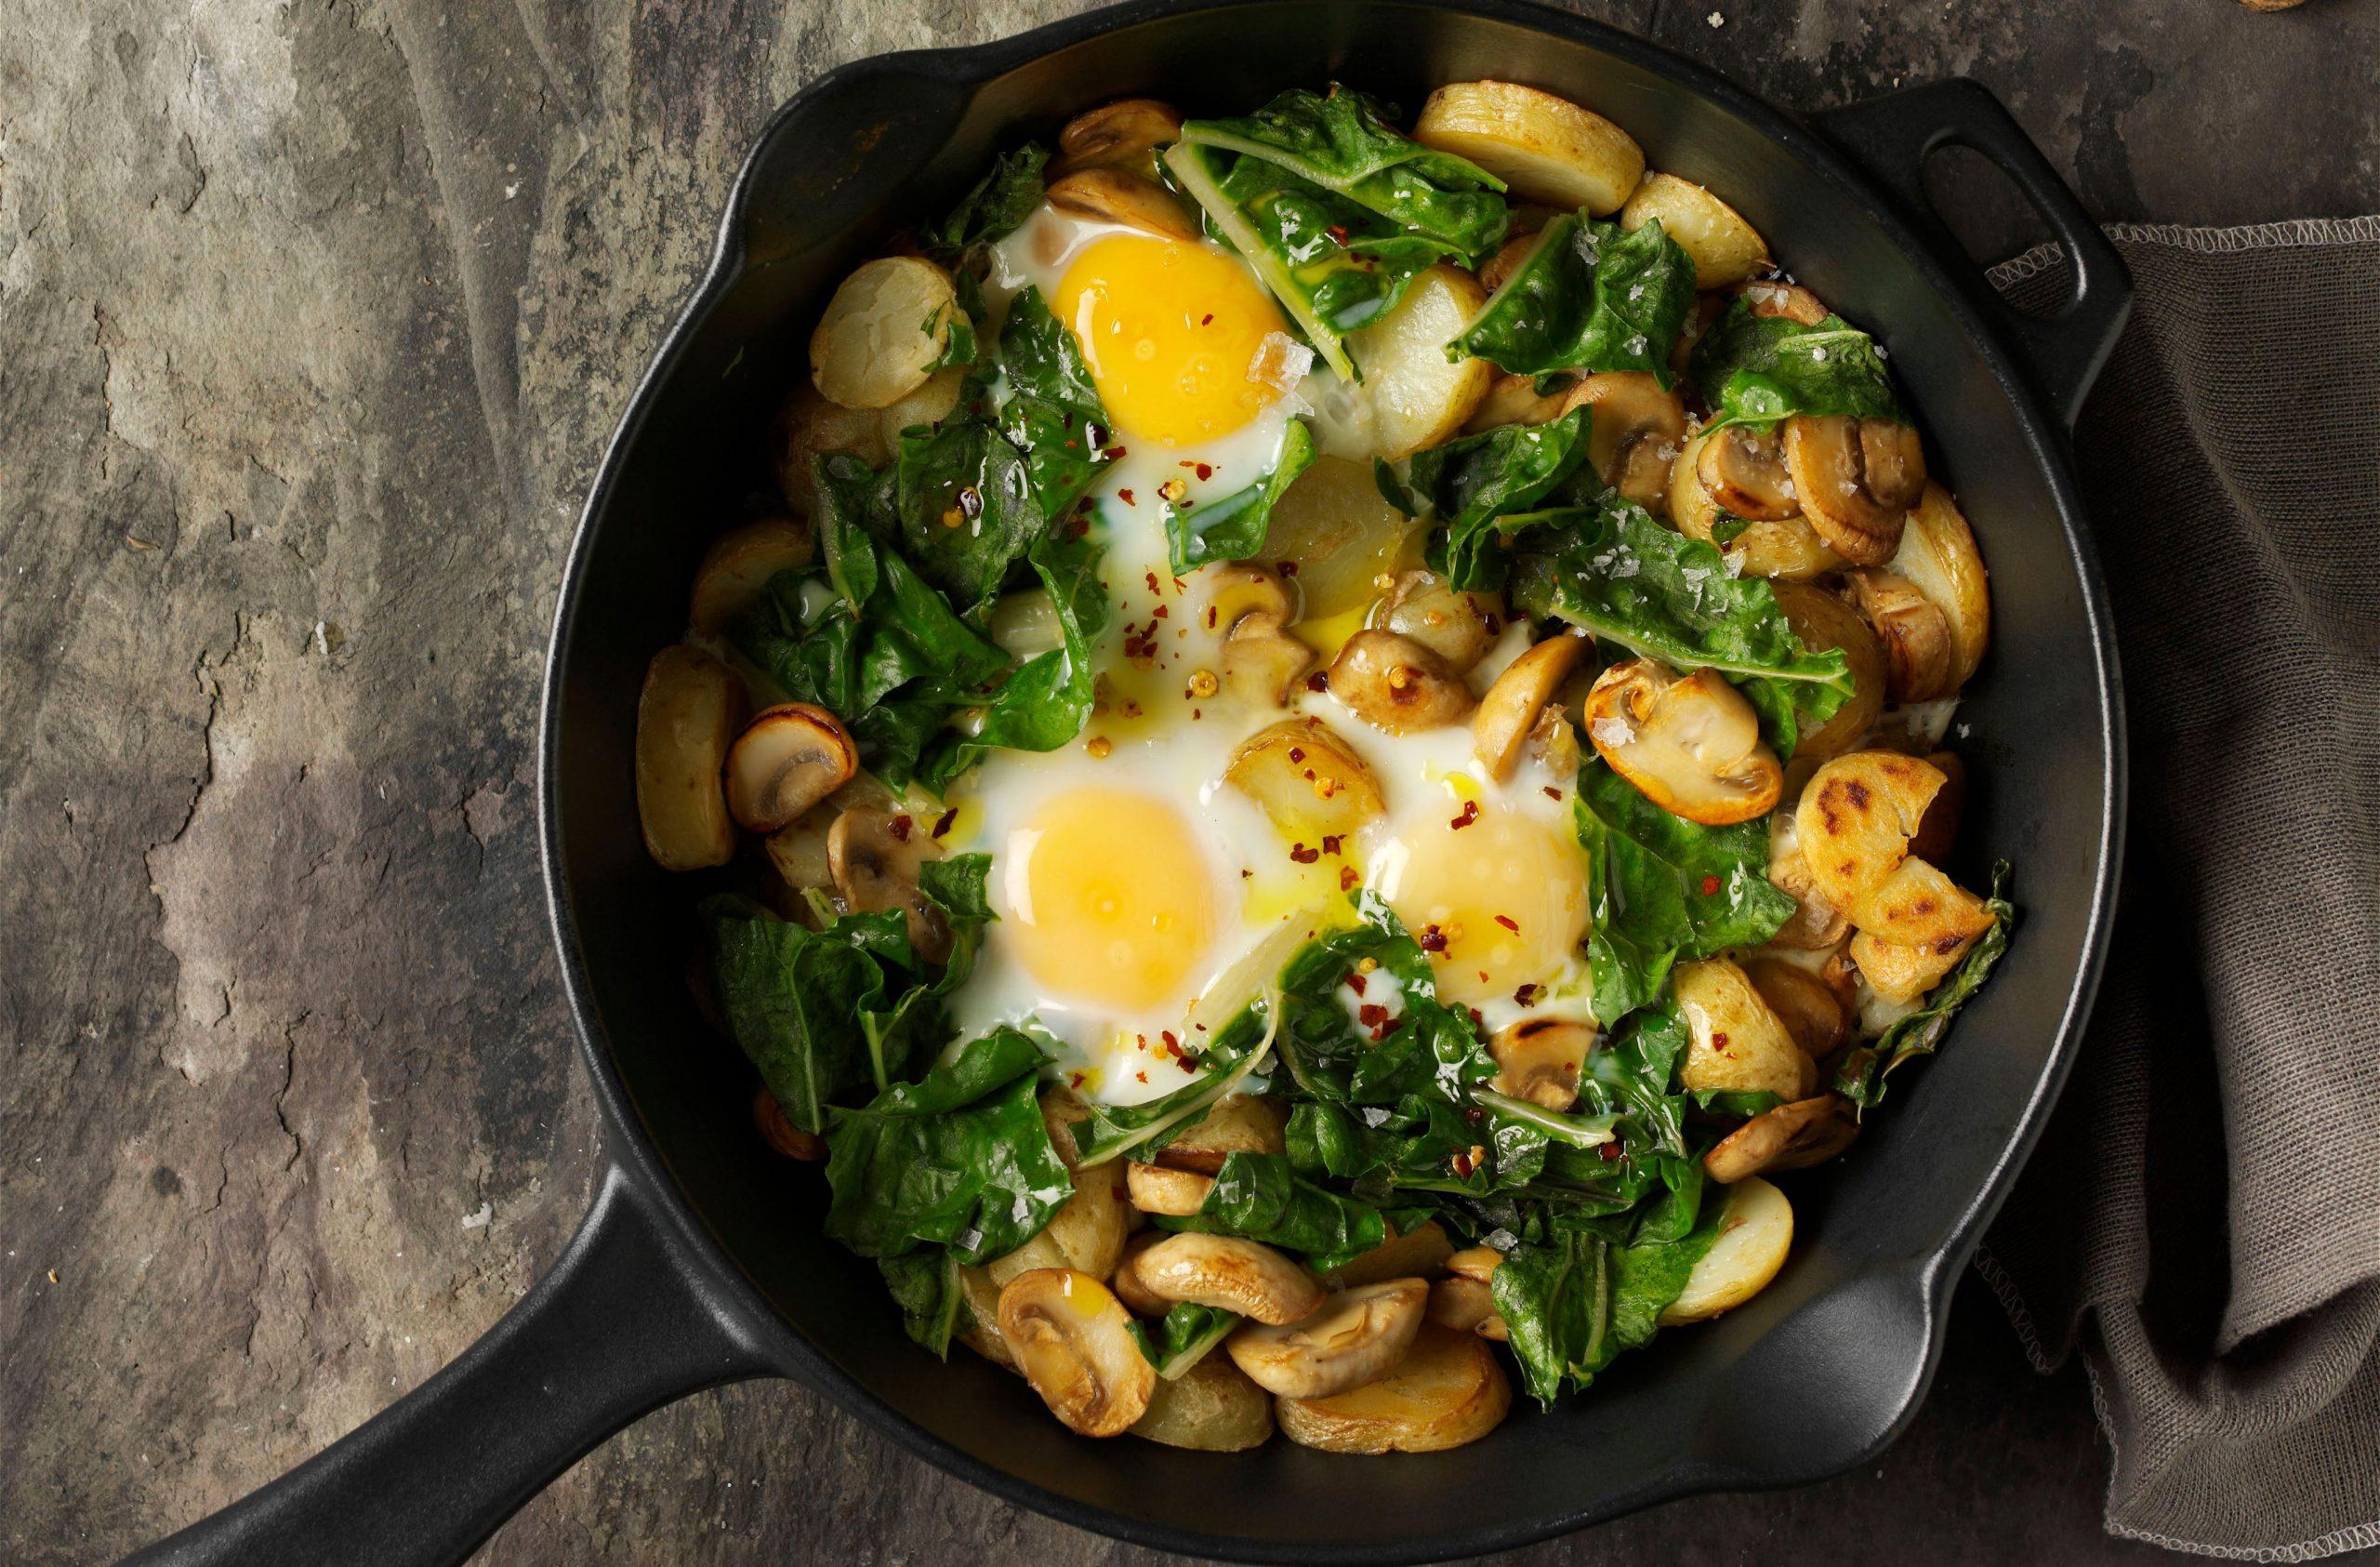 One of 10 new potato recipes